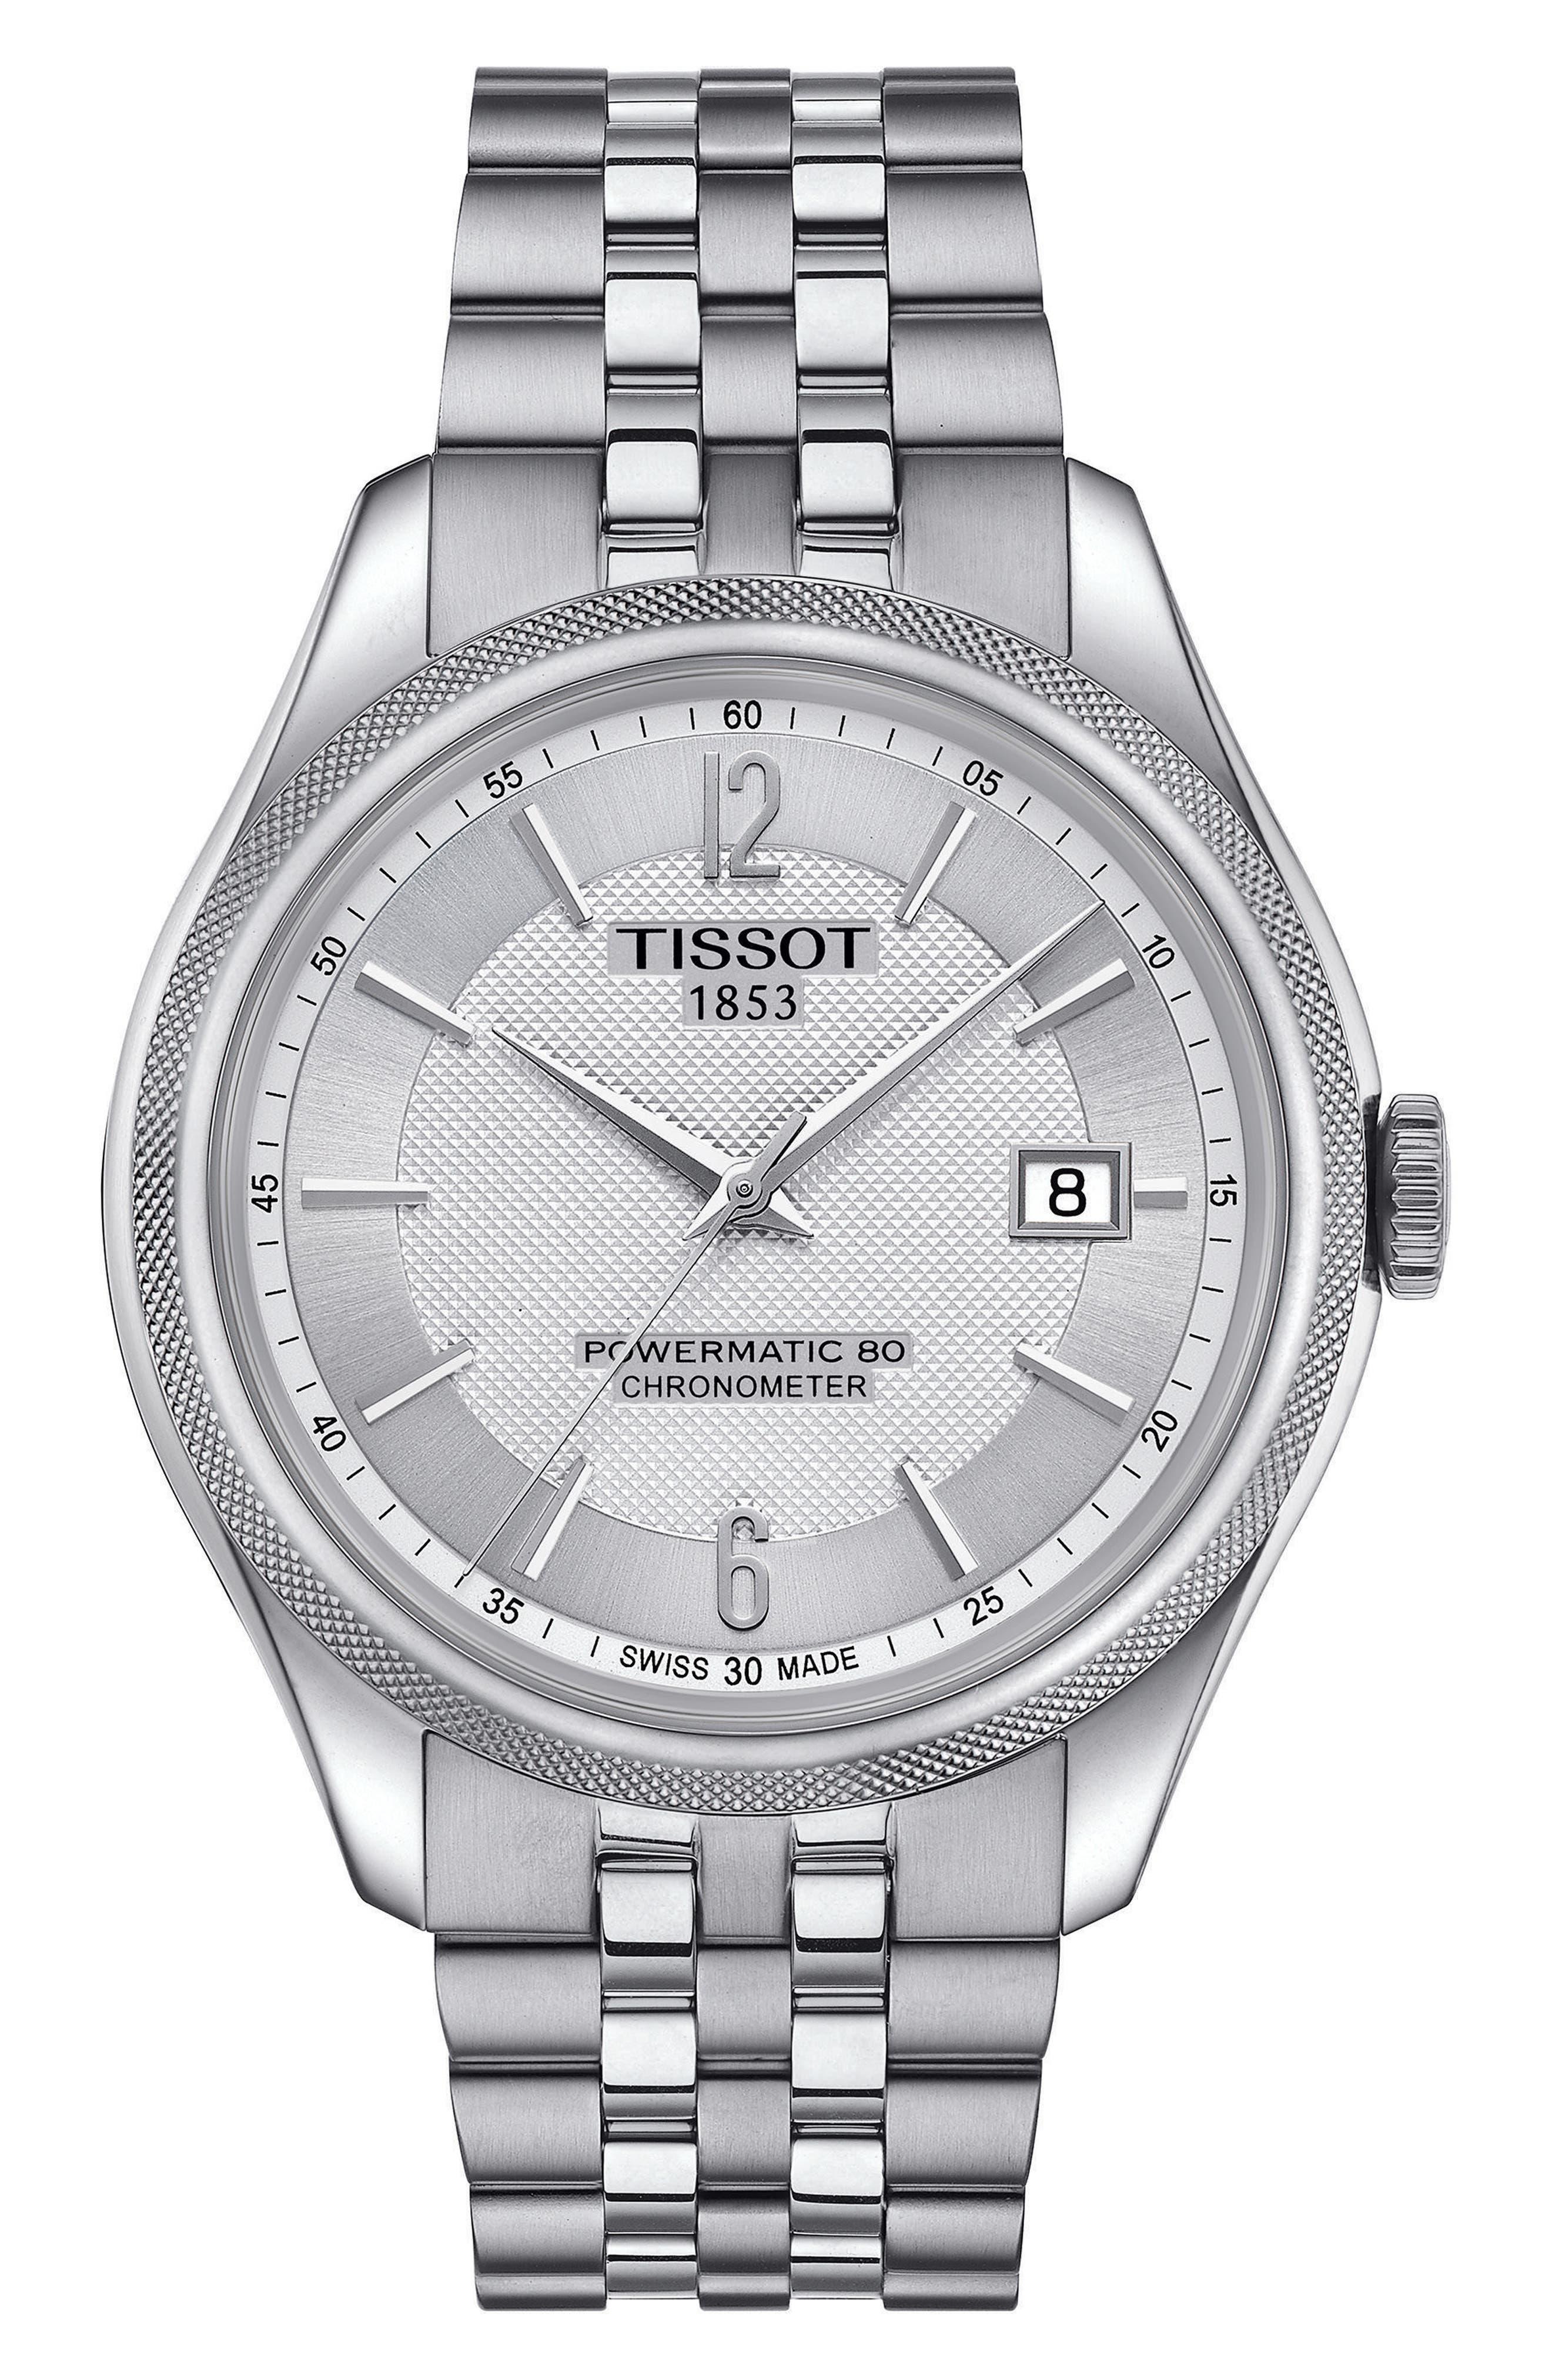 Alternate Image 1 Selected - Tissot Ballade Powermatic 80 Chronometer Bracelet Watch, 39mm x 41mm